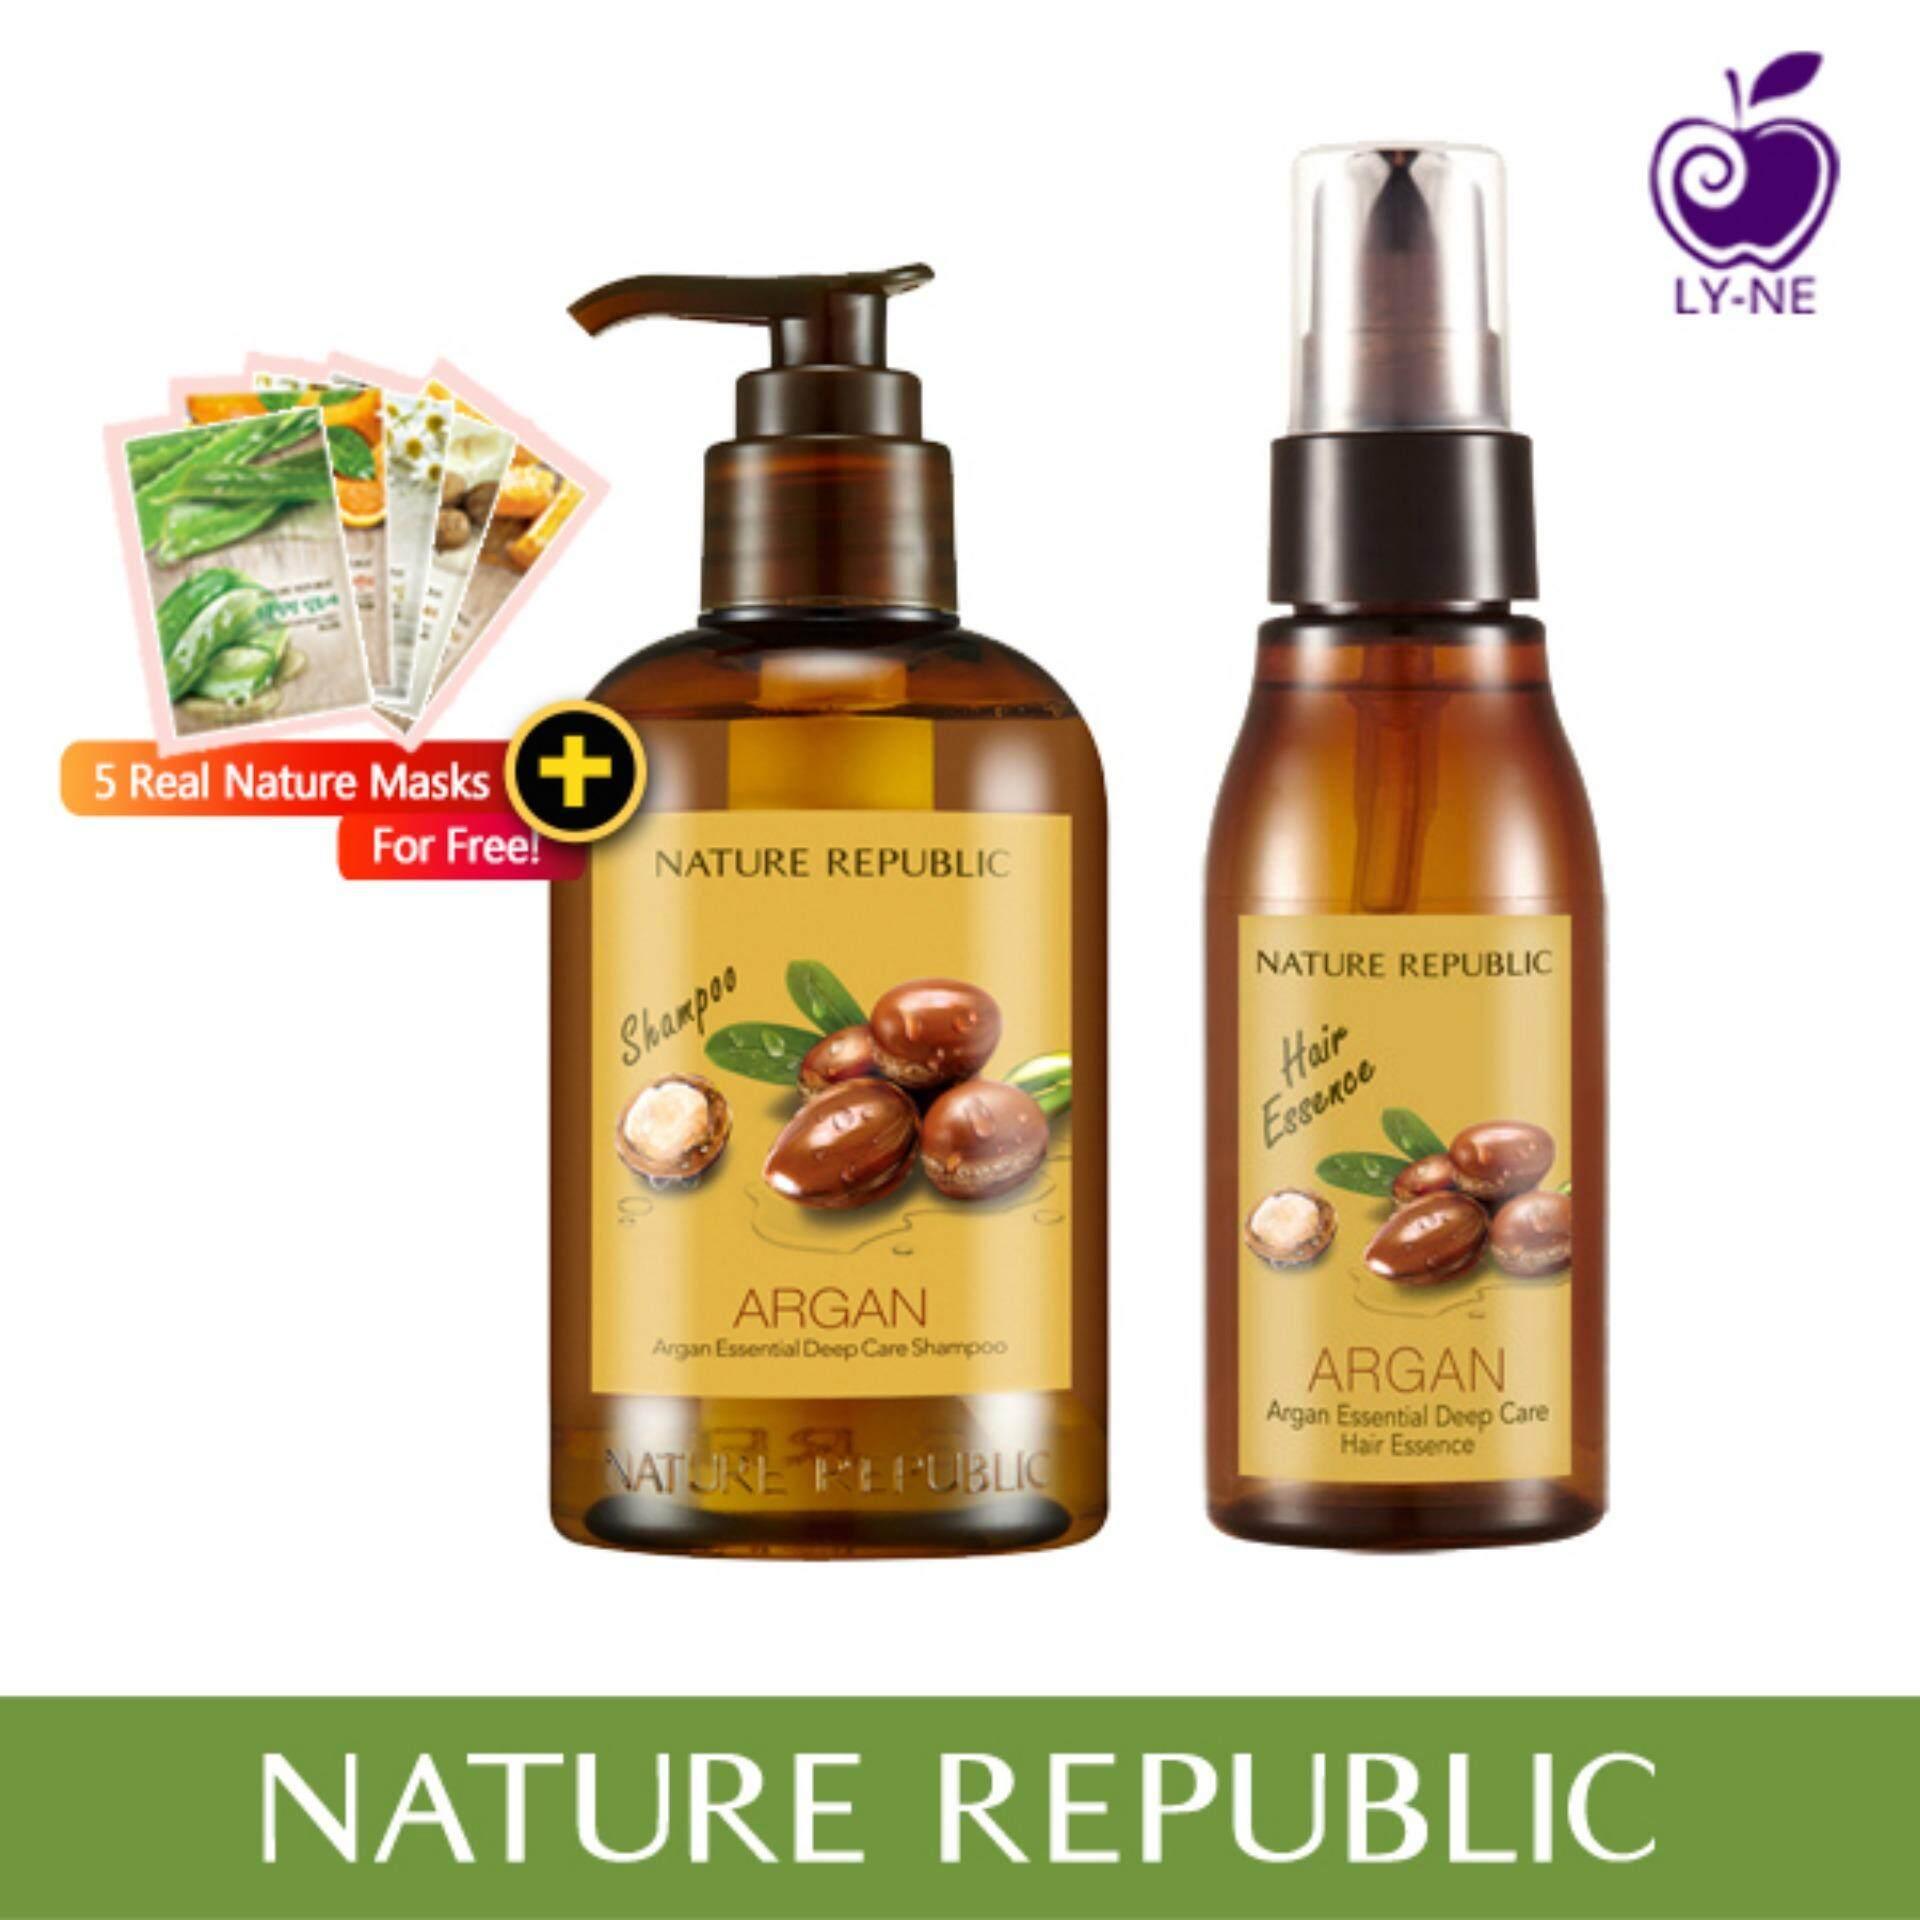 Cek Harga Pantene Shampoo Nature Care Full Life 170ml Terbaru Sampo Total Damage 480ml Republic Argan Essential Deep Hair Essence